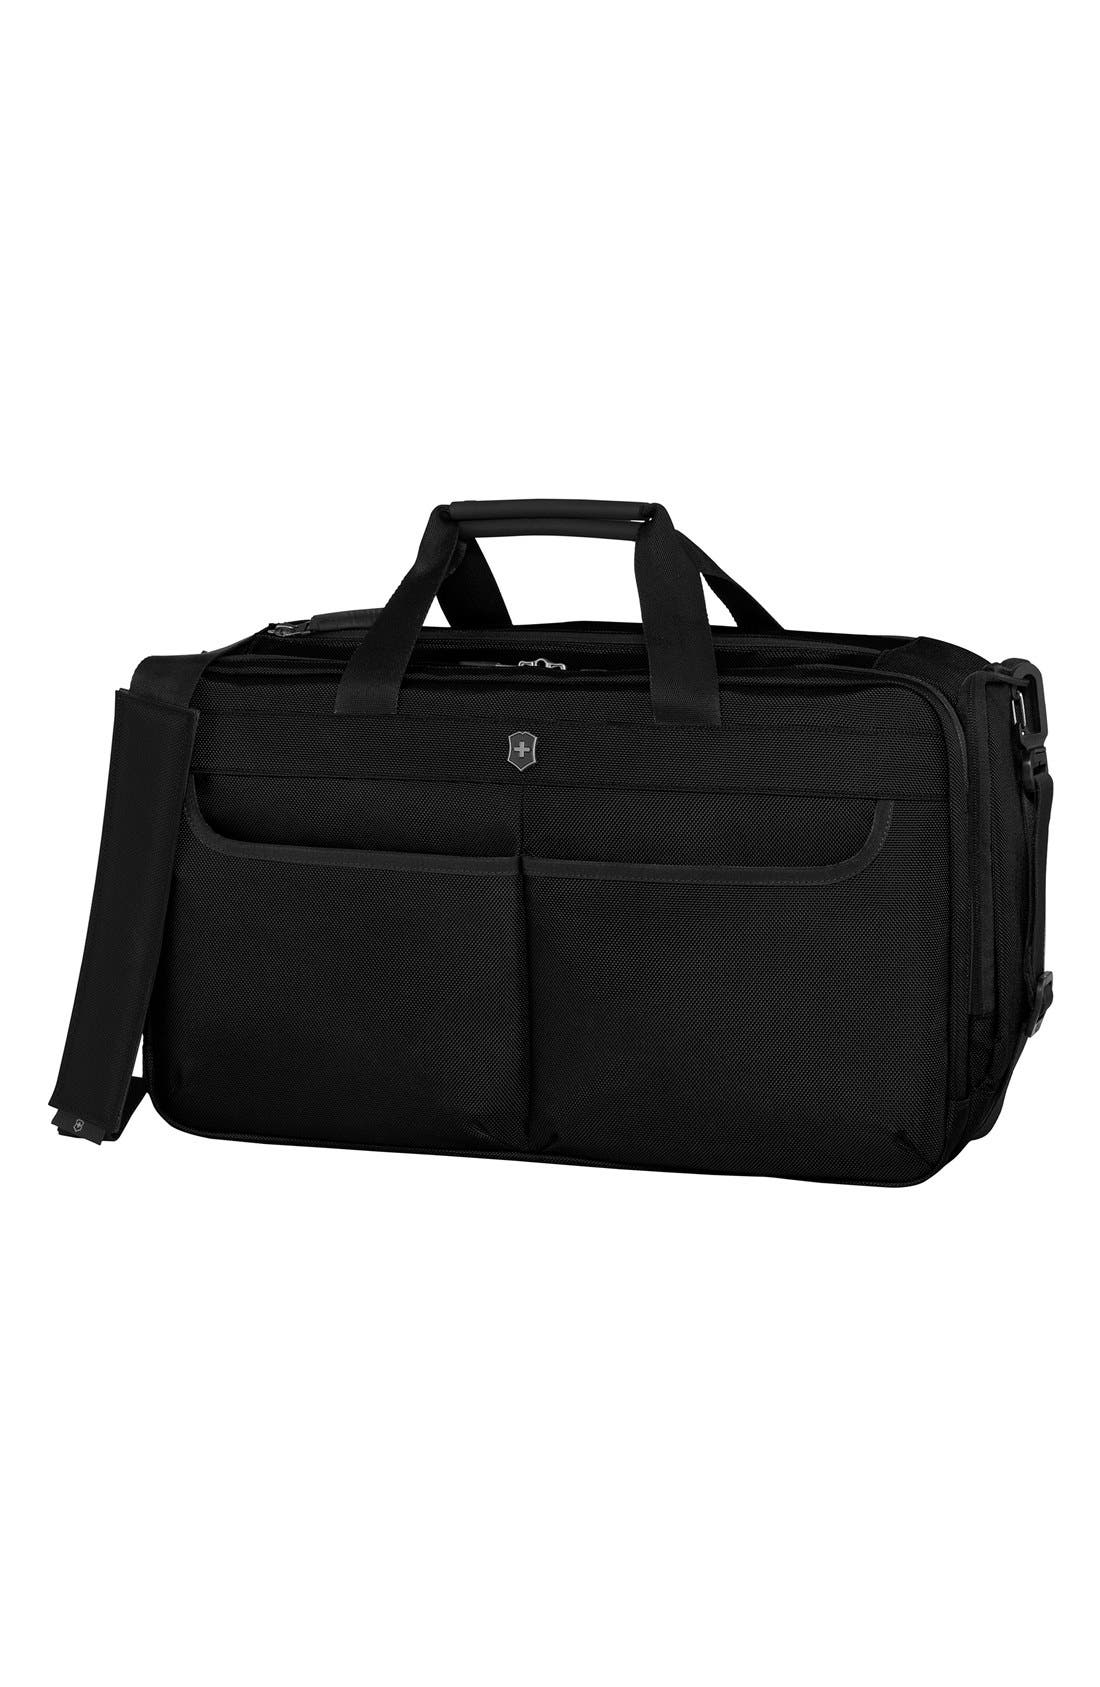 VICTORINOX SWISS ARMY<SUP>®</SUP> WT 5.0 Duffel Bag